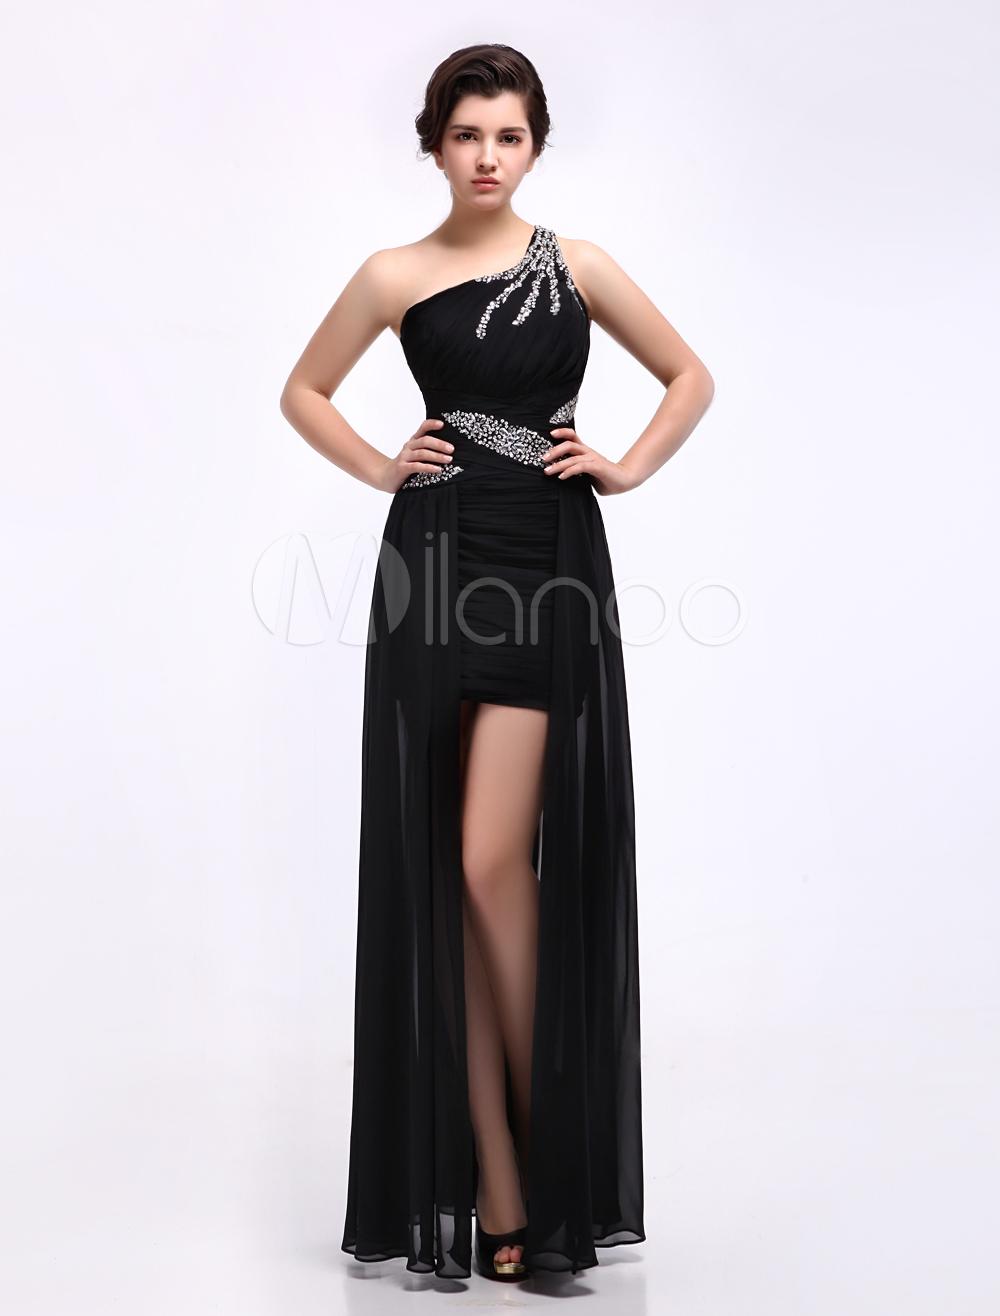 Sheath Black Ruched One-Shoulder Floor-Length Fashion Prom Dress (Wedding Prom Dresses) photo